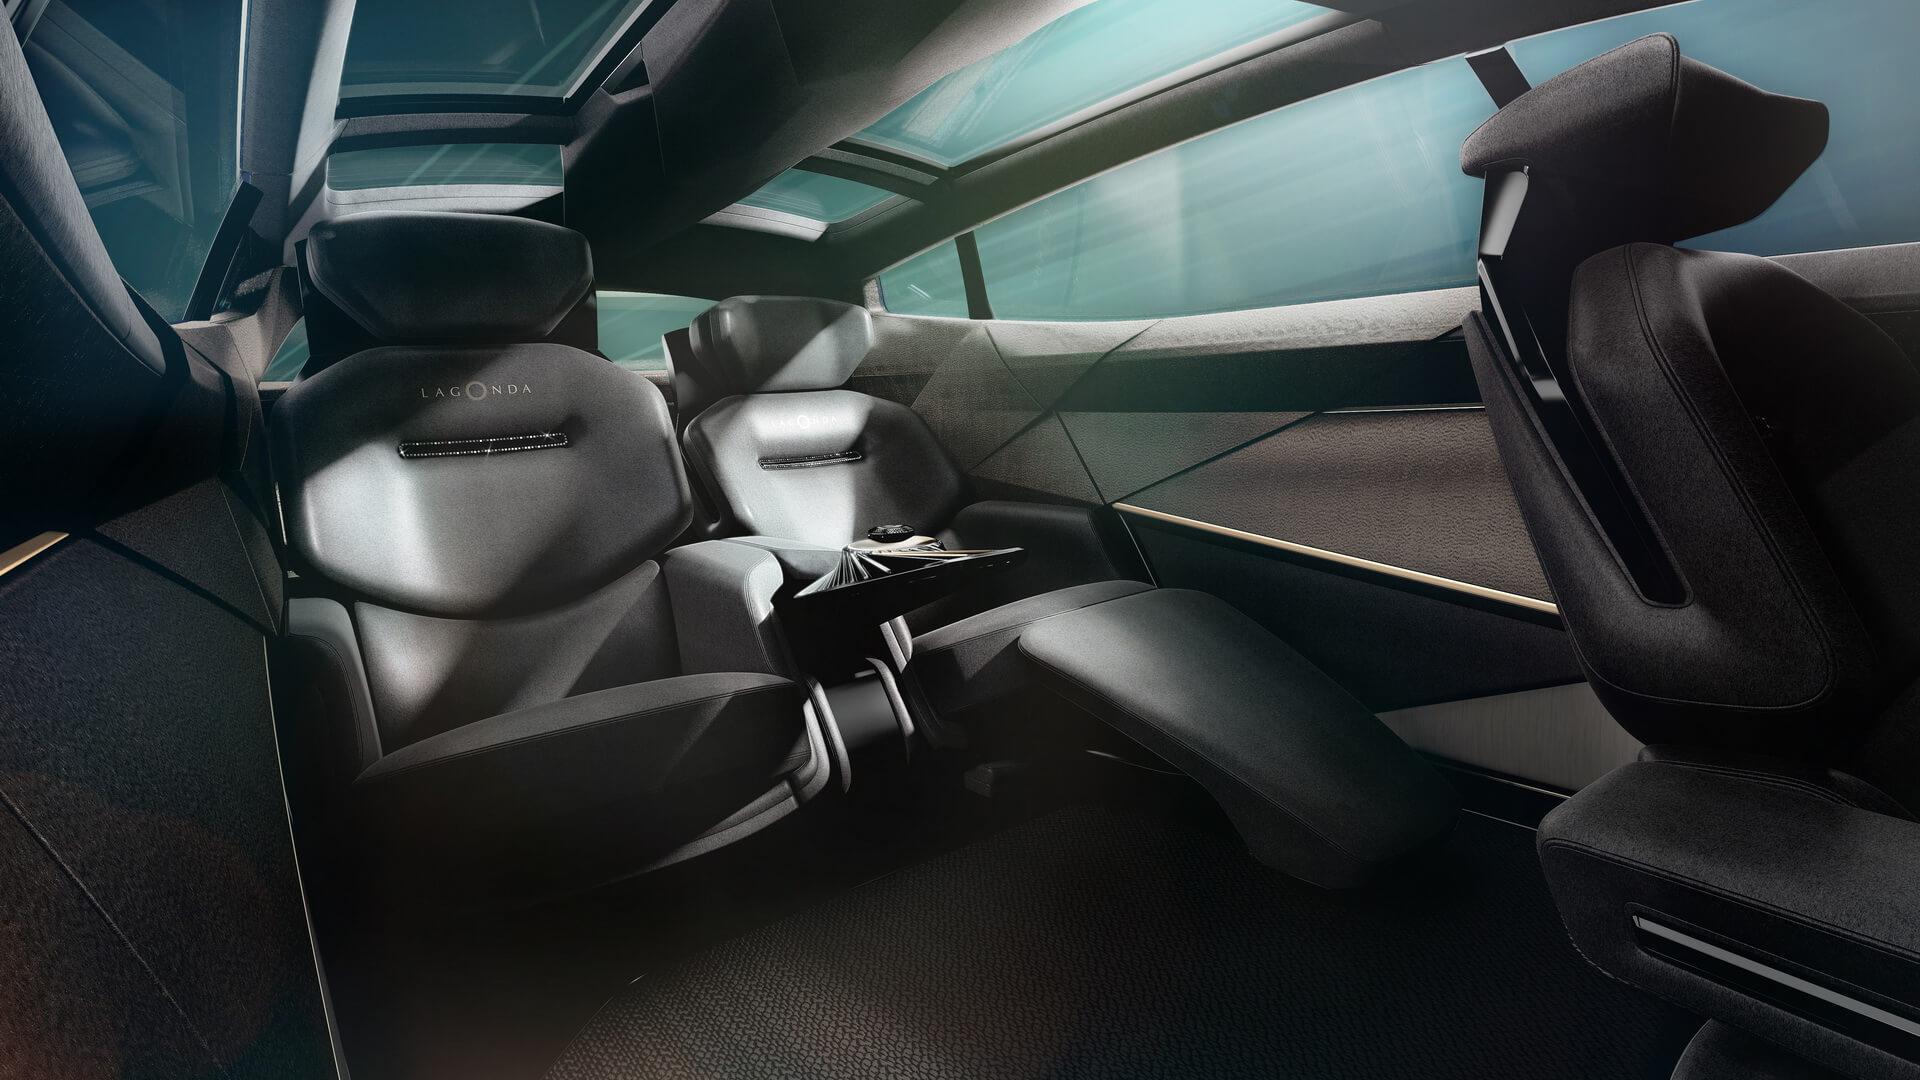 Задний ряд сидений Lagonda All-Terrain